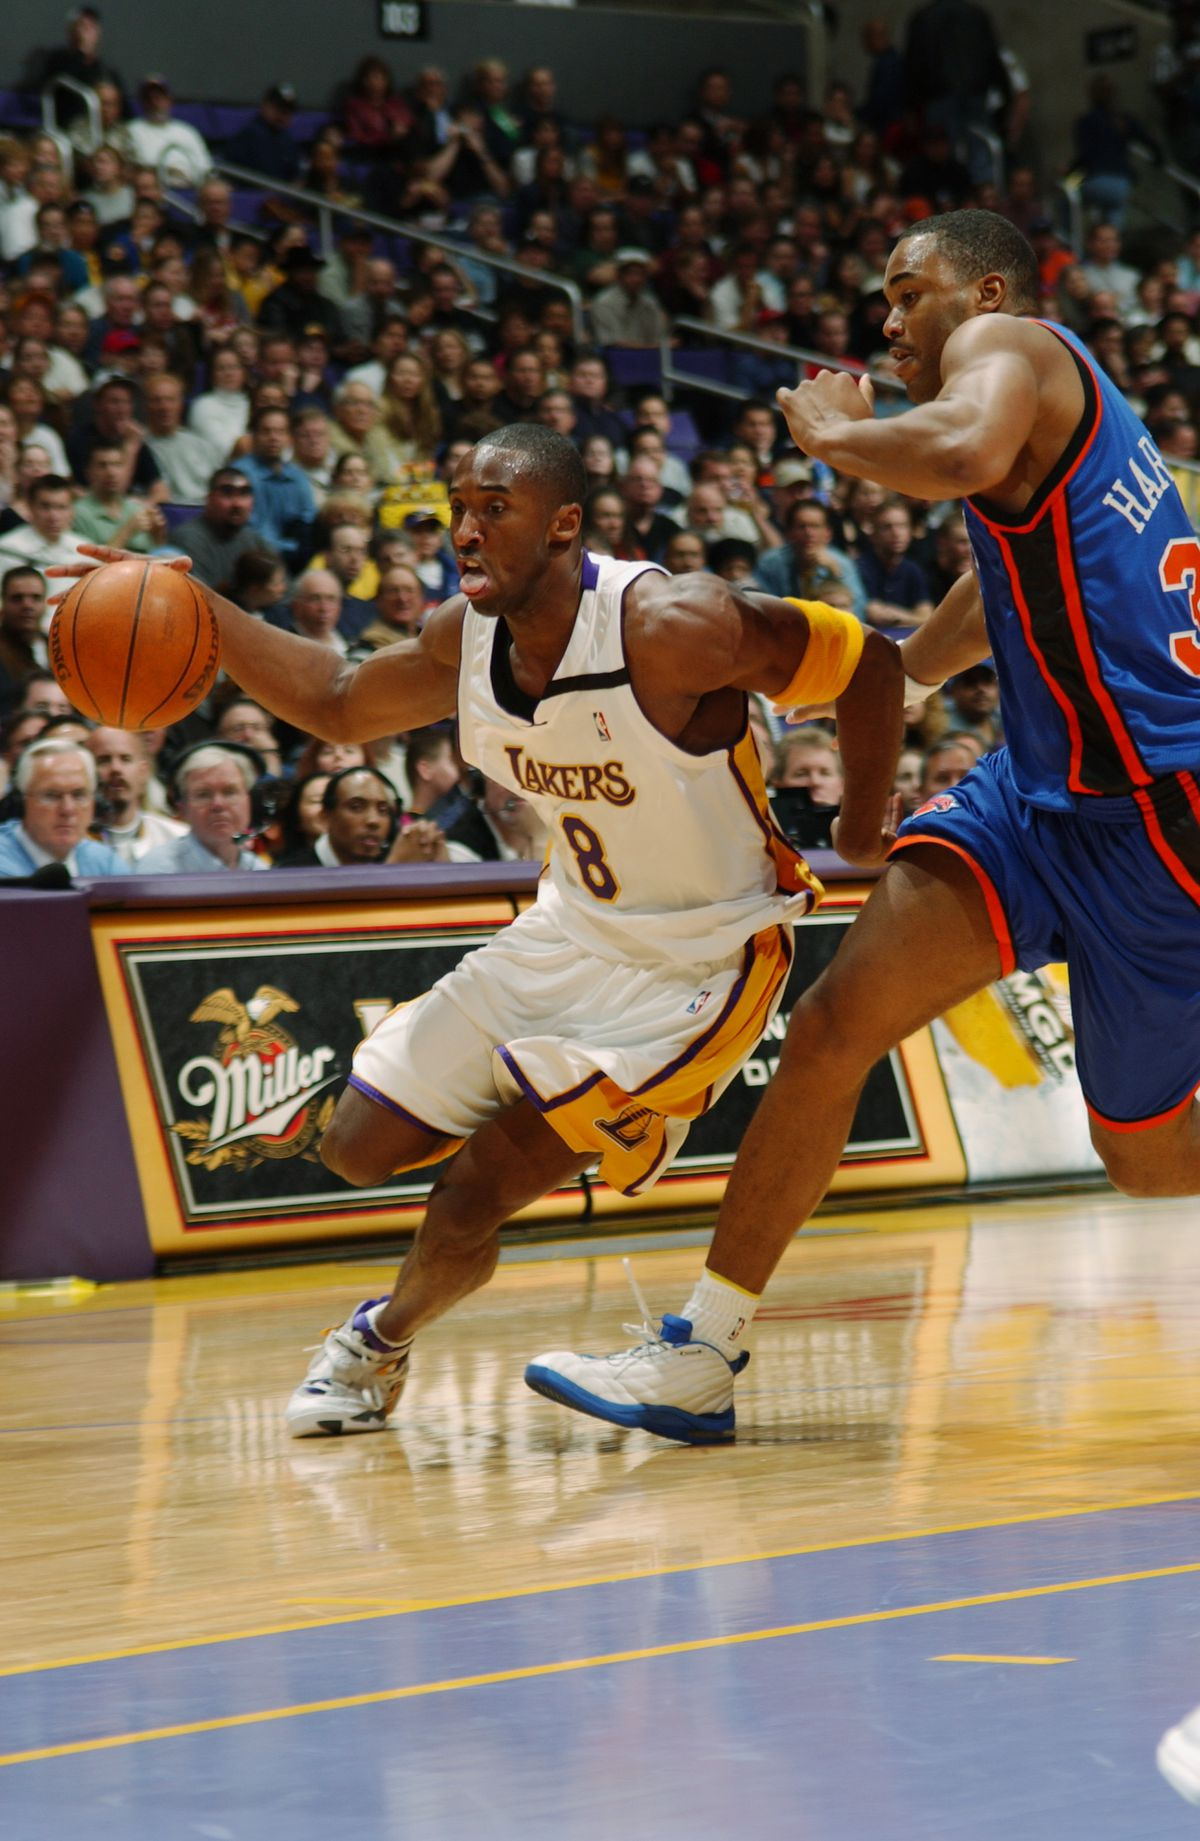 Kobe Bryant drives around Othella Harrington